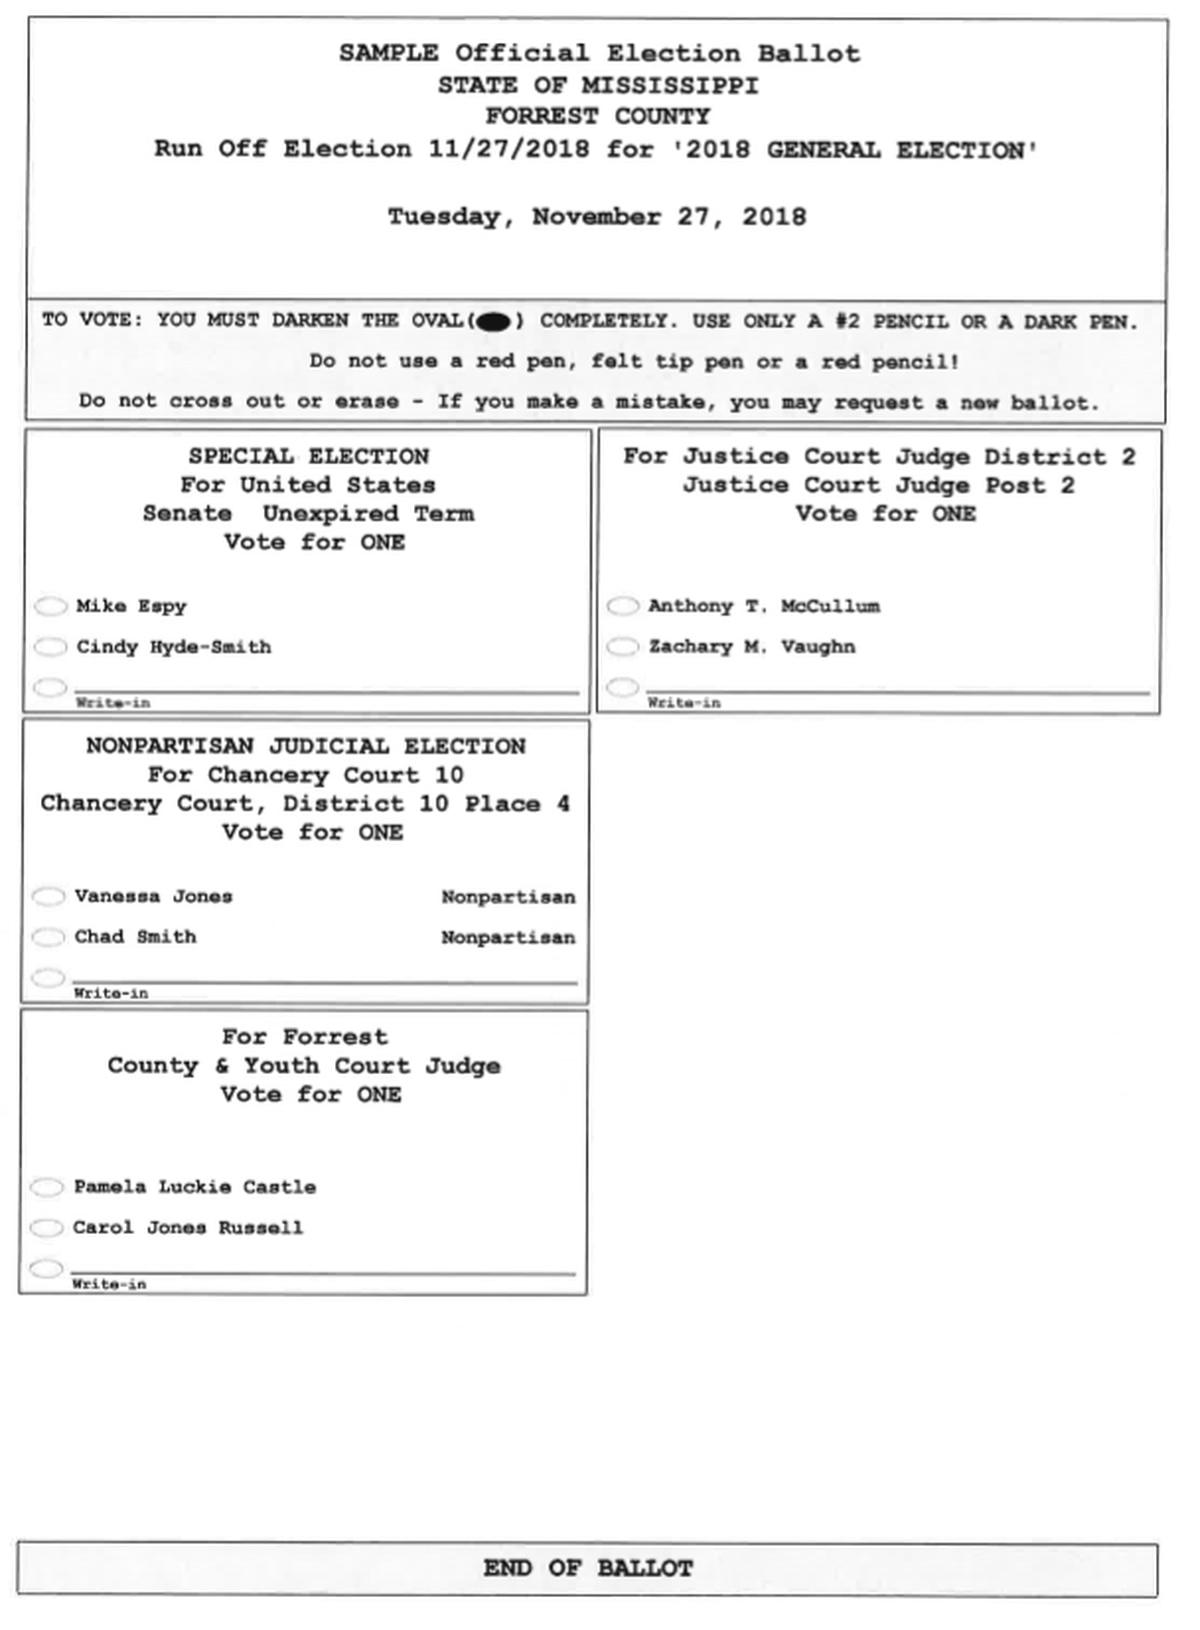 Sample ballots for runoff